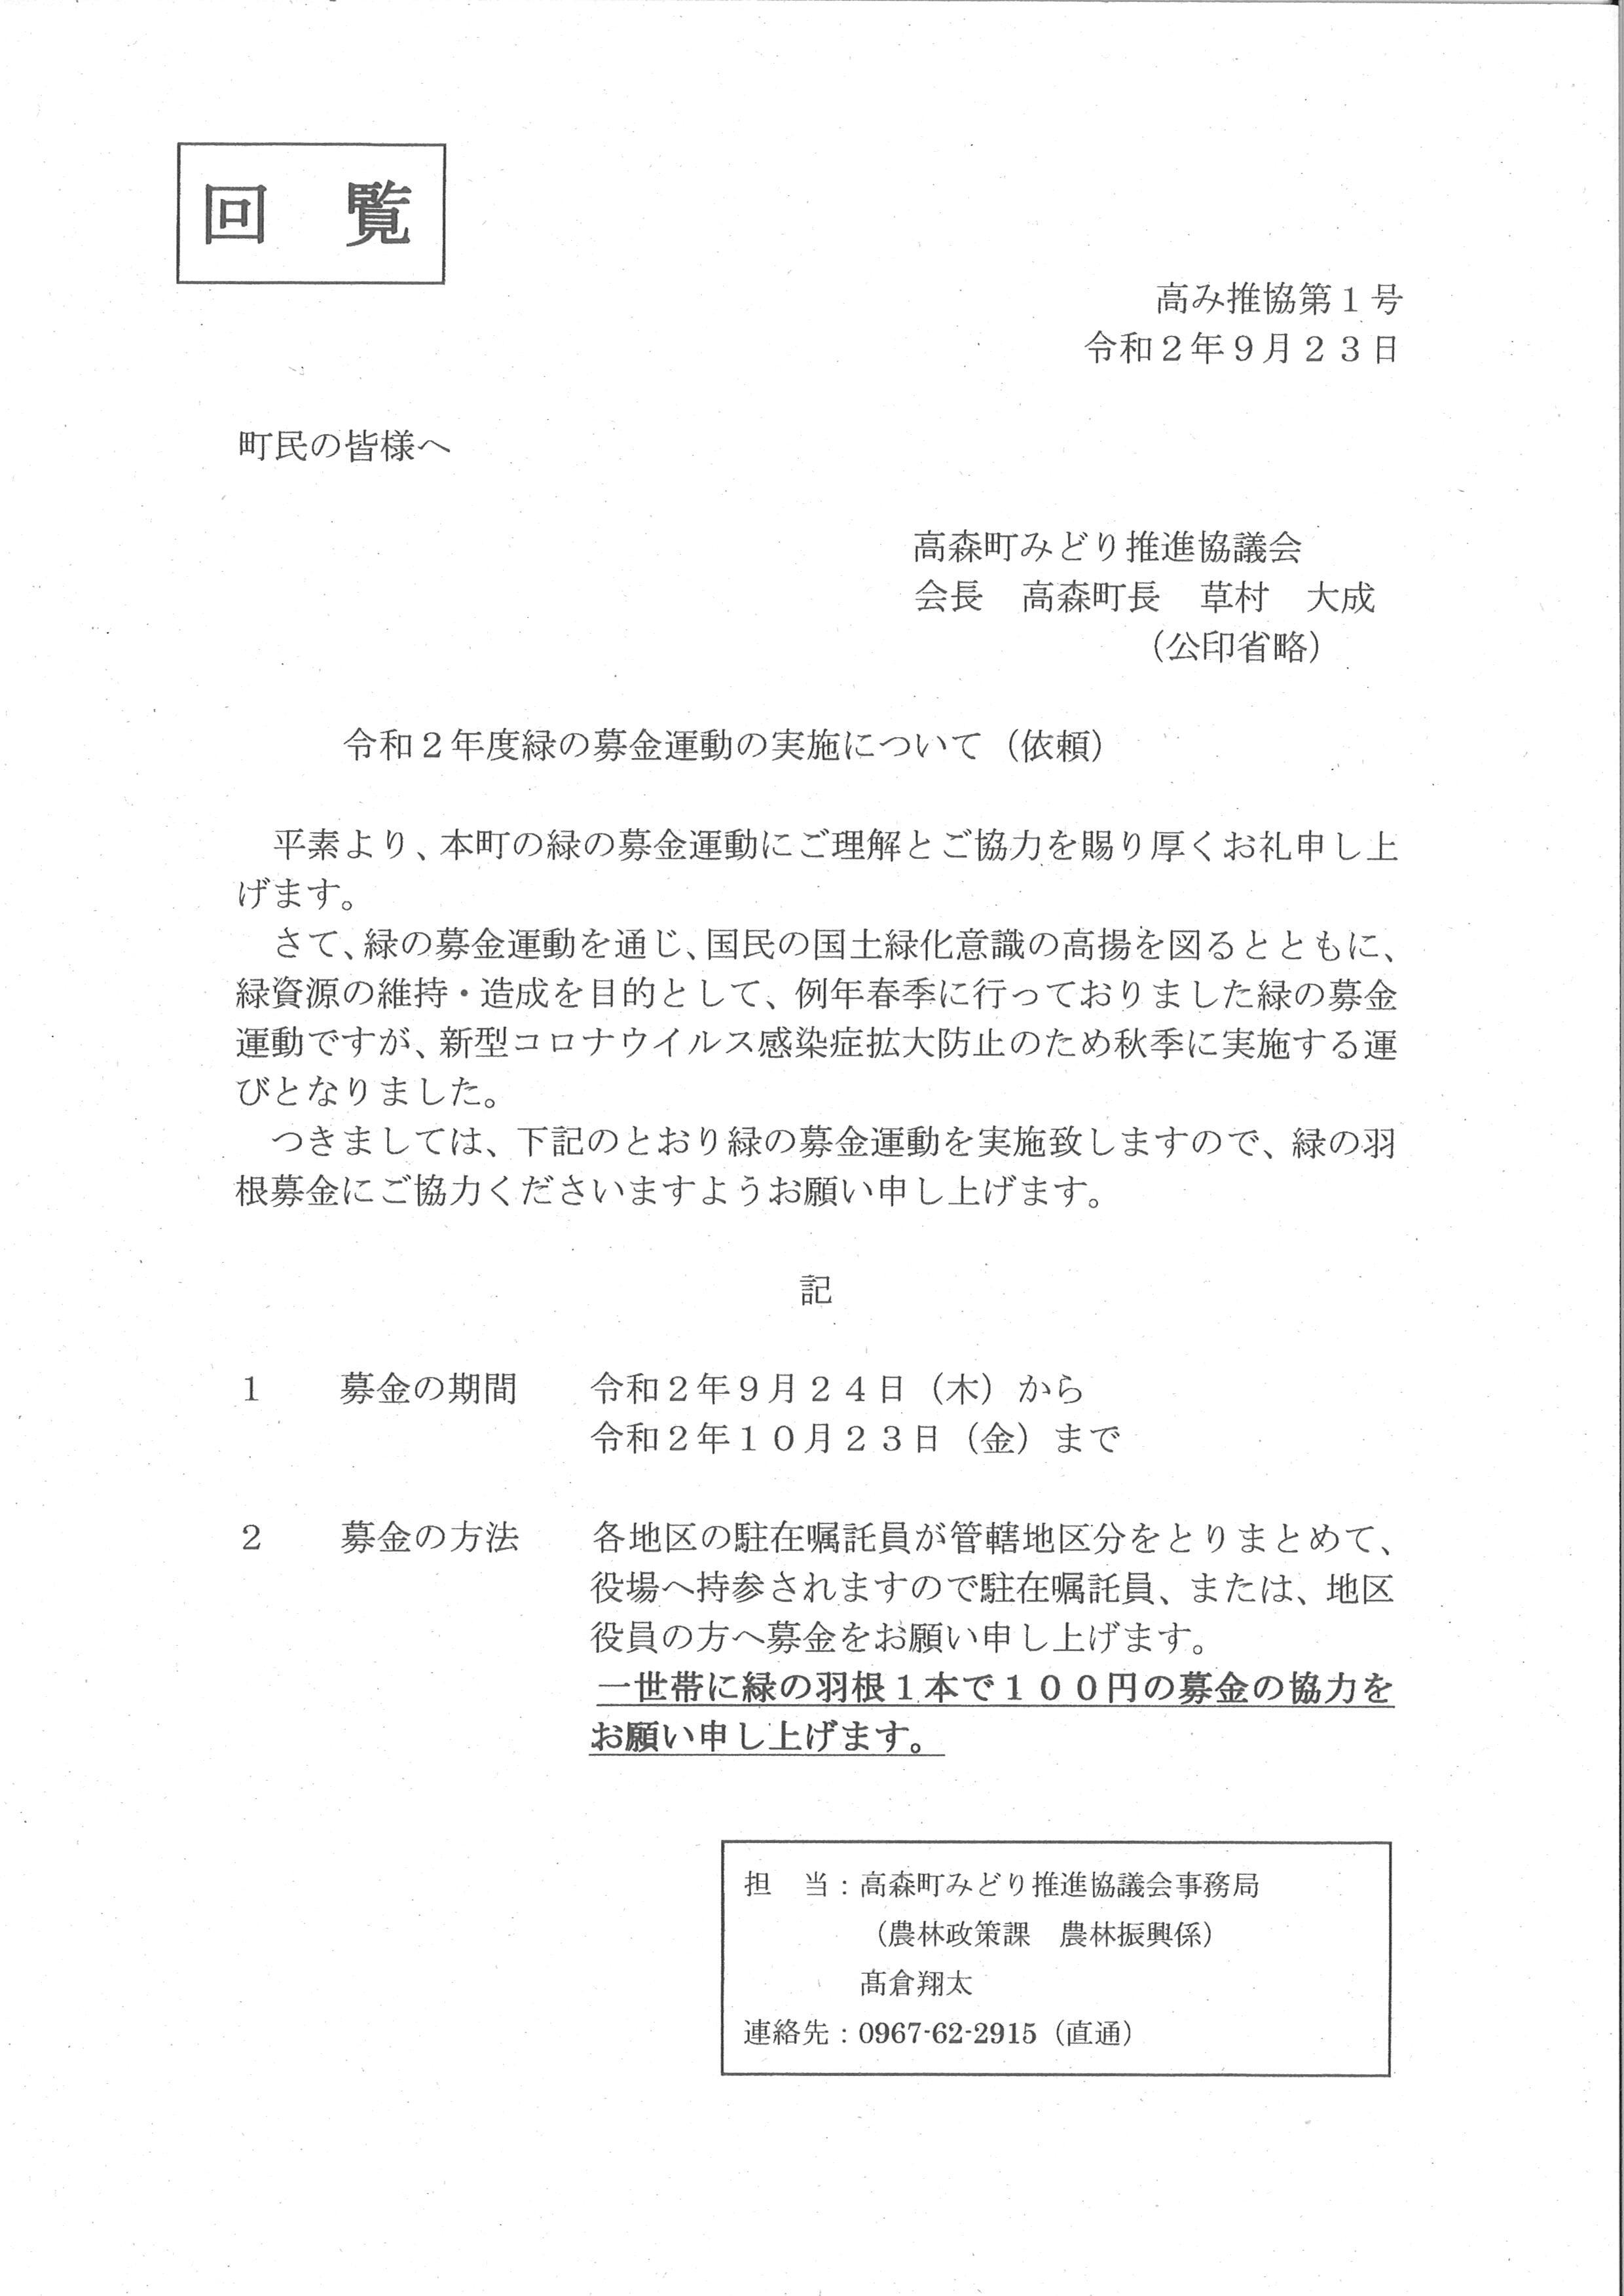 http://www.town.takamori.kumamoto.jp/chosha/somu/upload/6cc072137a63b64b66c5f13e1959ec2976a56d96.jpg